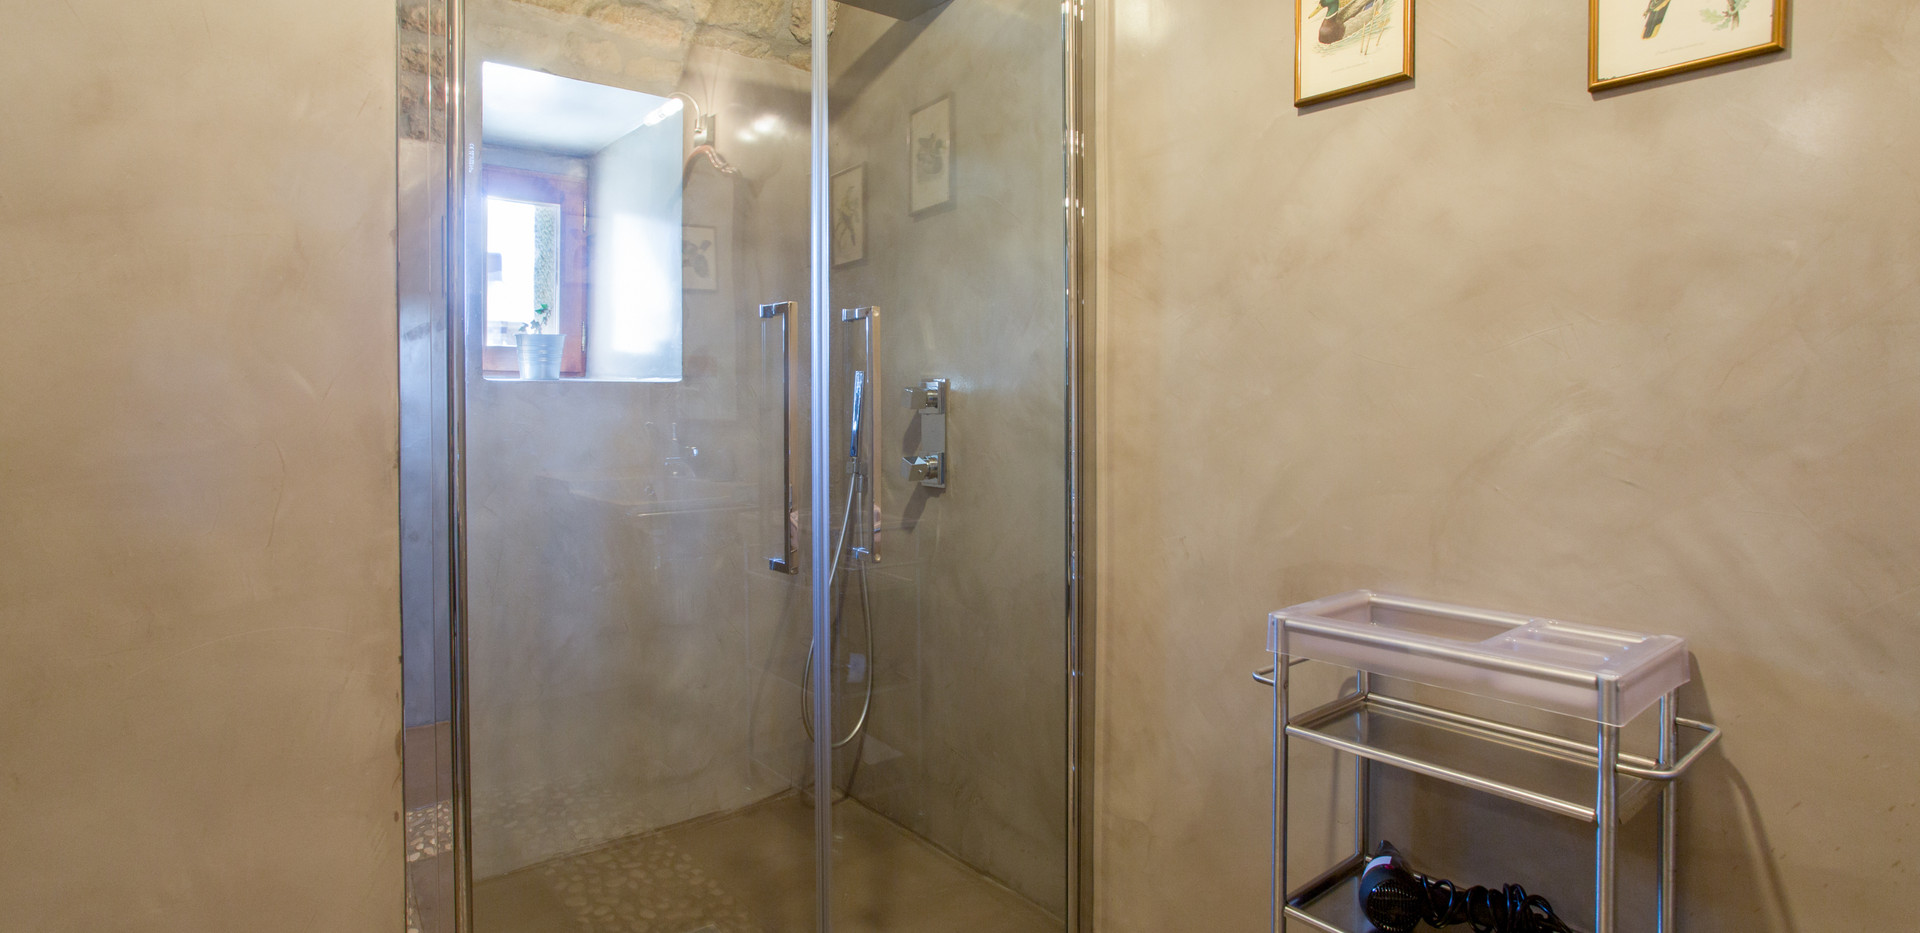 Baño en la planta baja